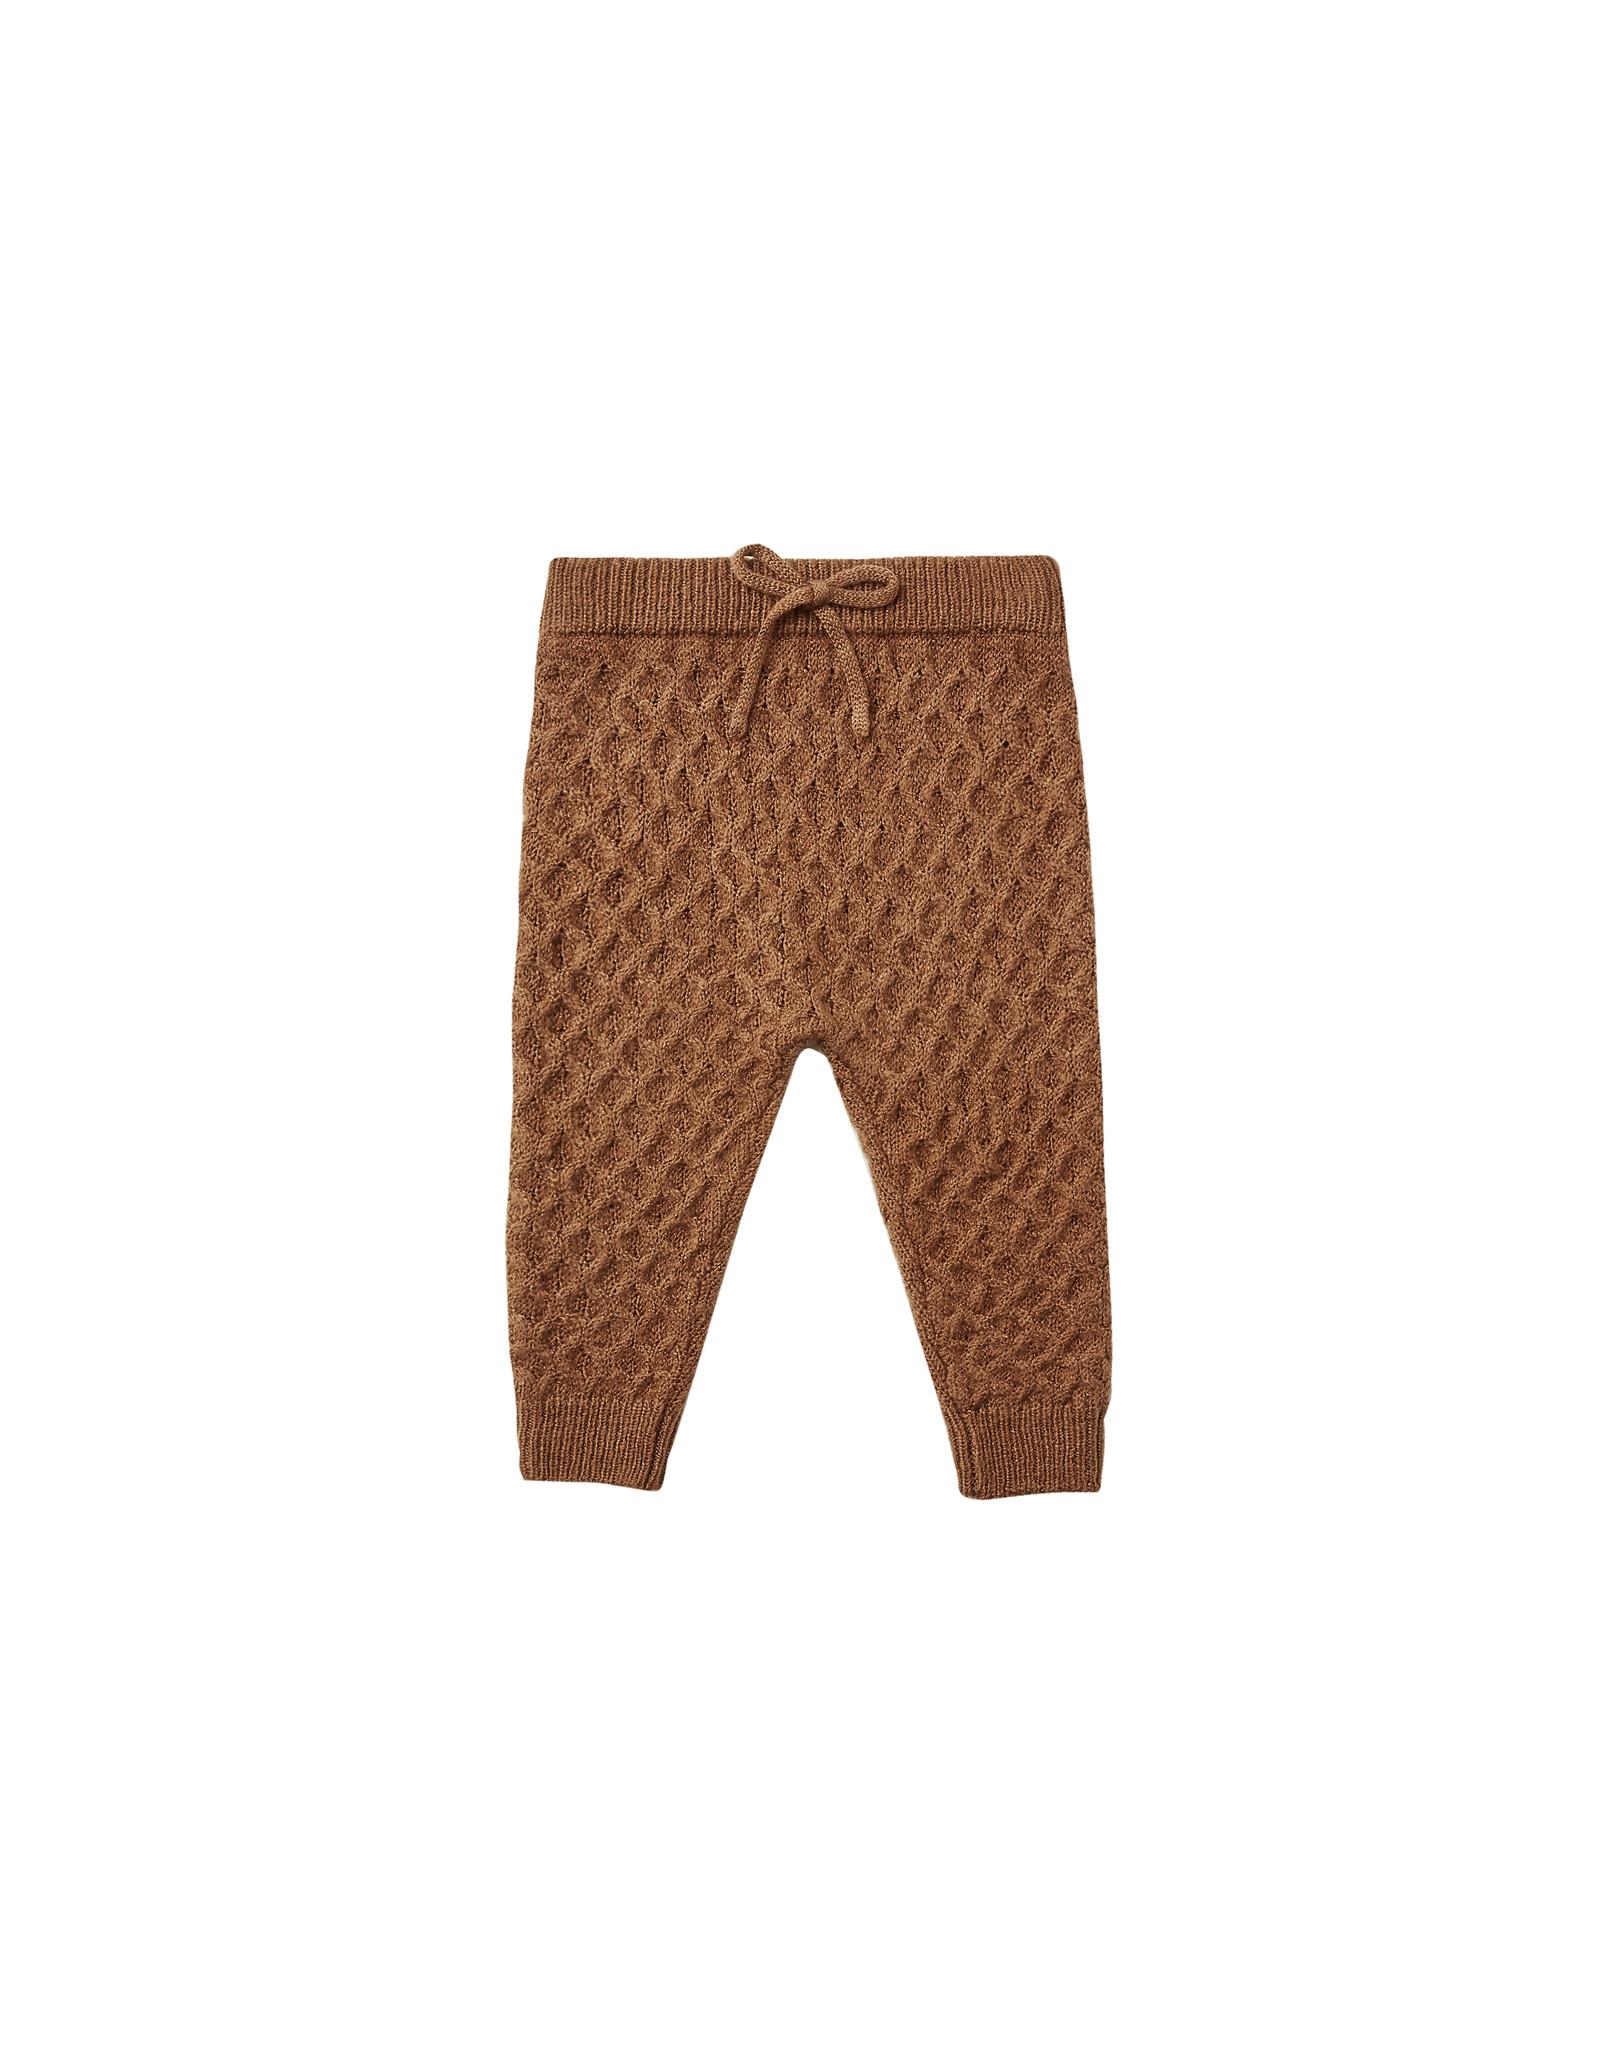 Rylee + Cru Knit Gable Pant